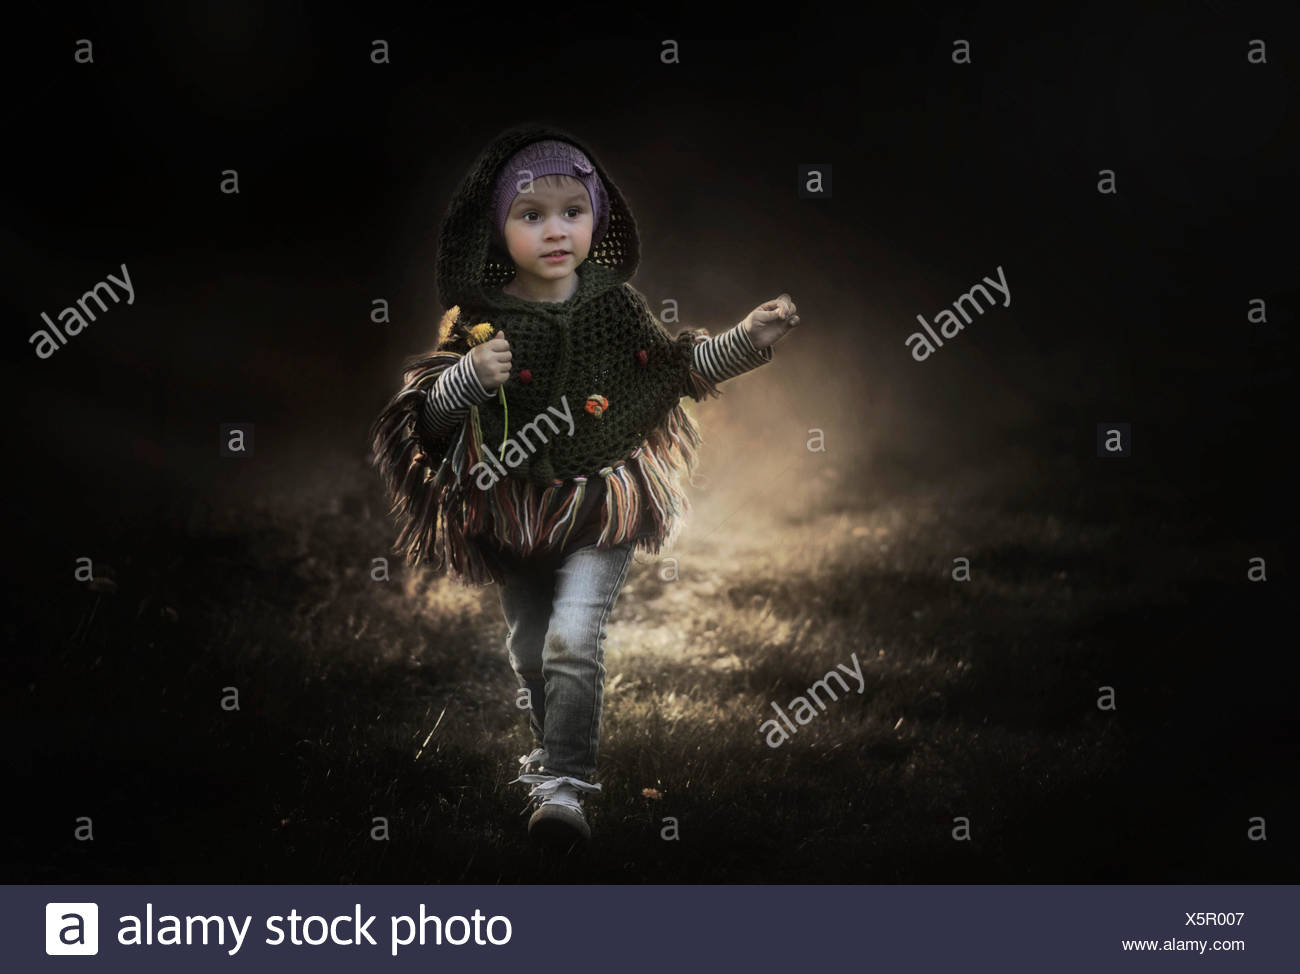 Girl running outdoors - Stock Image